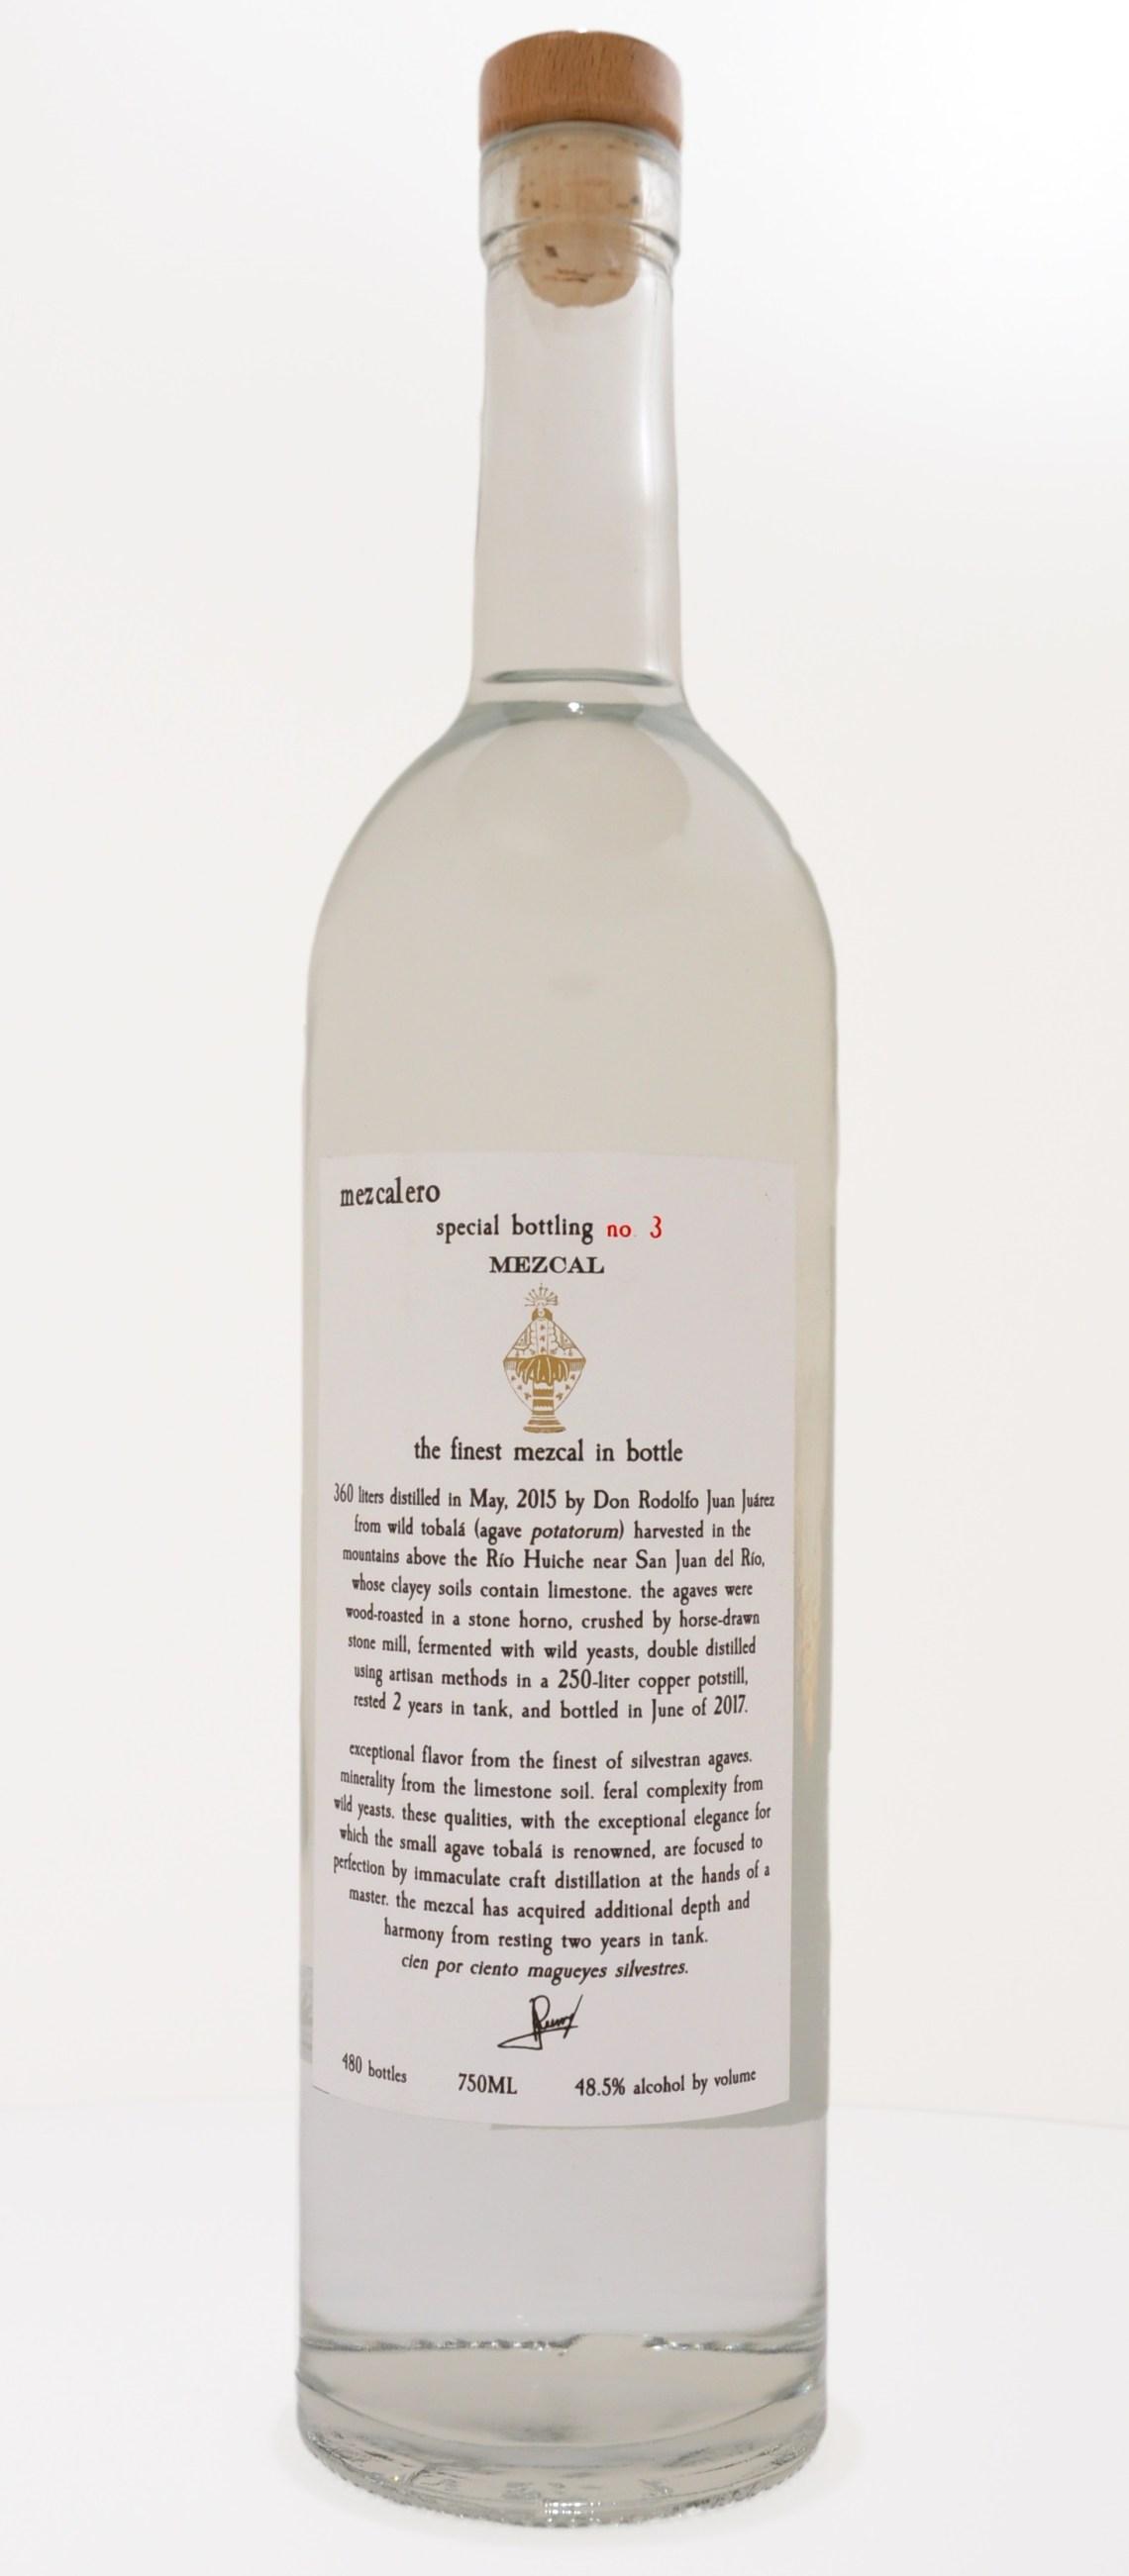 Mezcalero Special Bottling Release #3